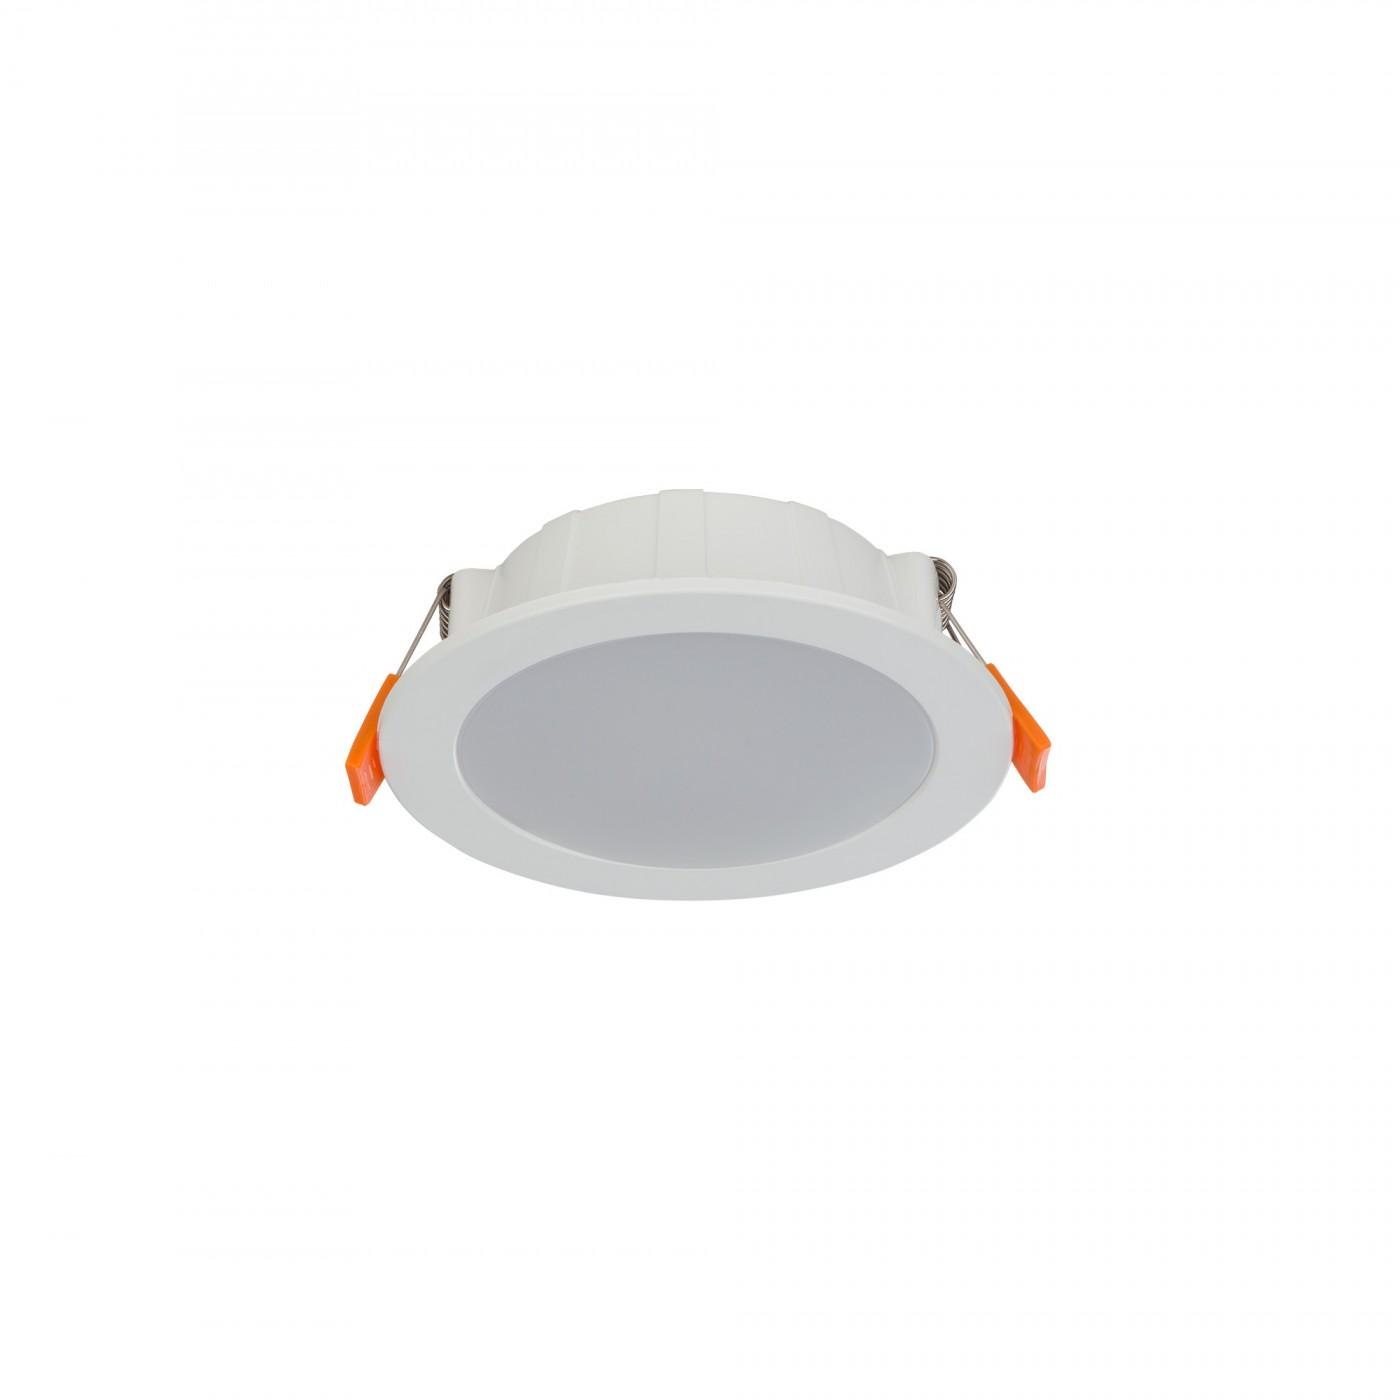 CL KOS LED 8W 4000K 8781 Nowodvorski Lighting